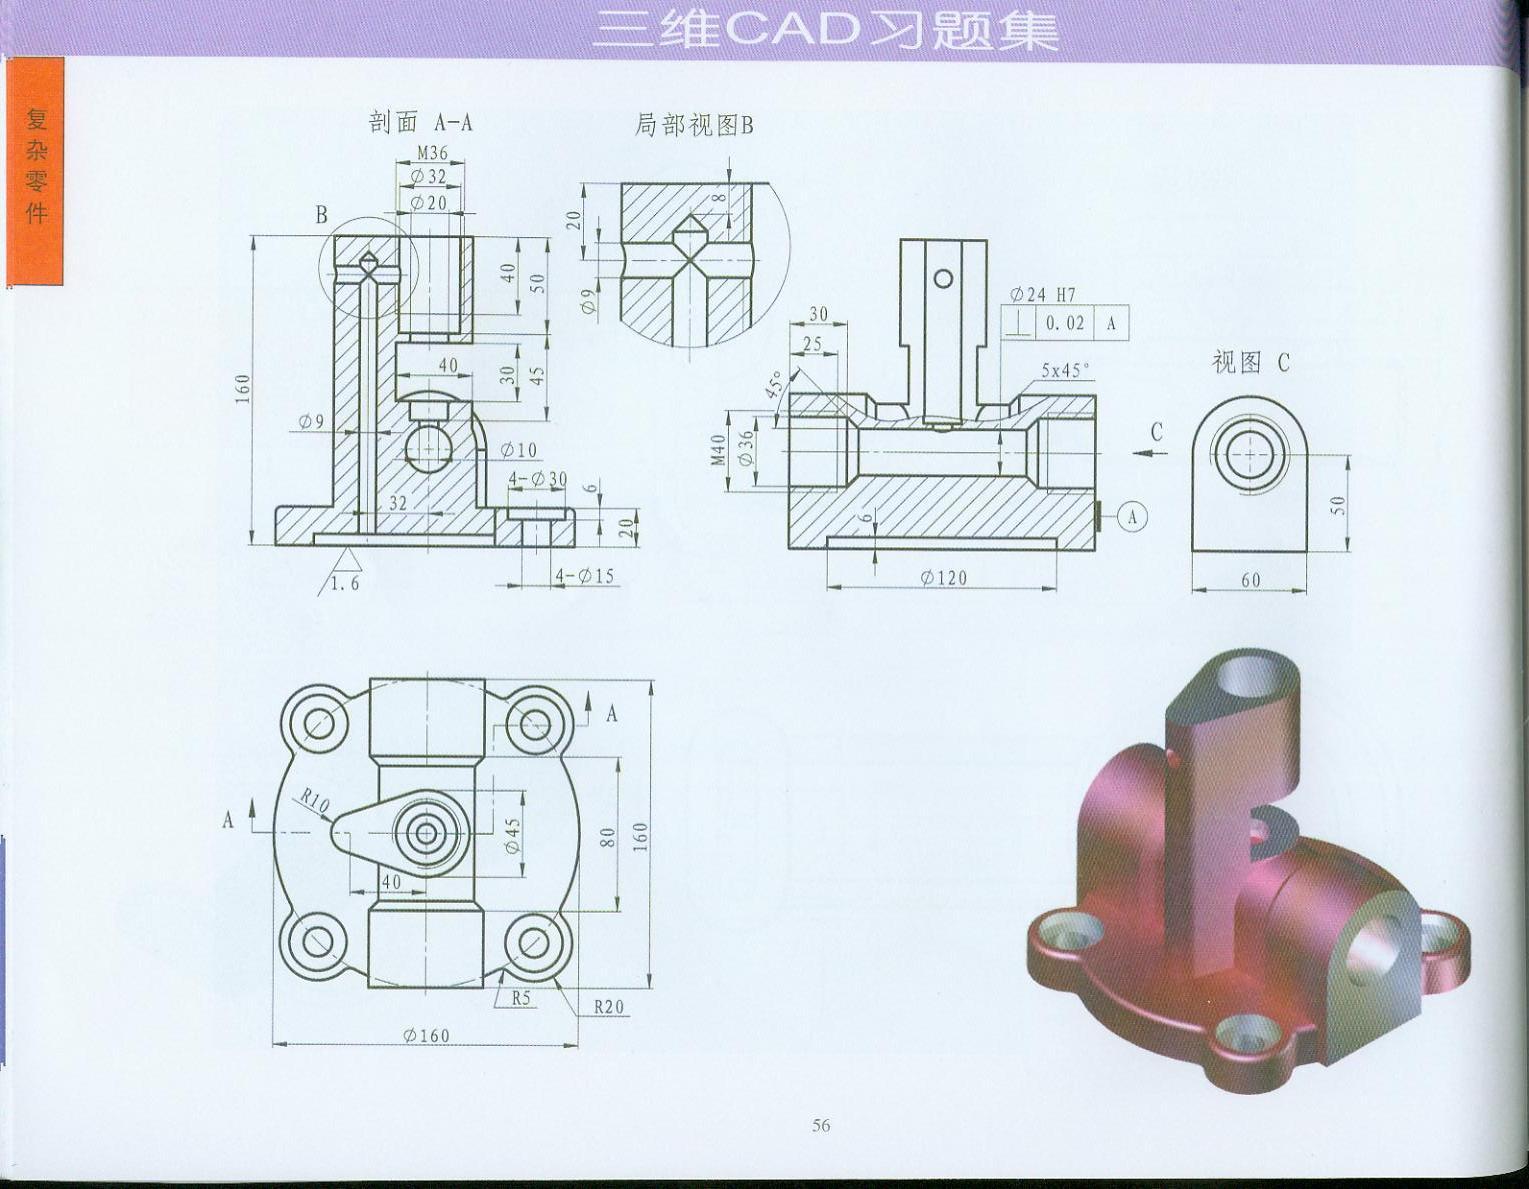 AutoCAD图纸v图纸-三维cad化工,机械,扫描版,1cad习题全集集图片